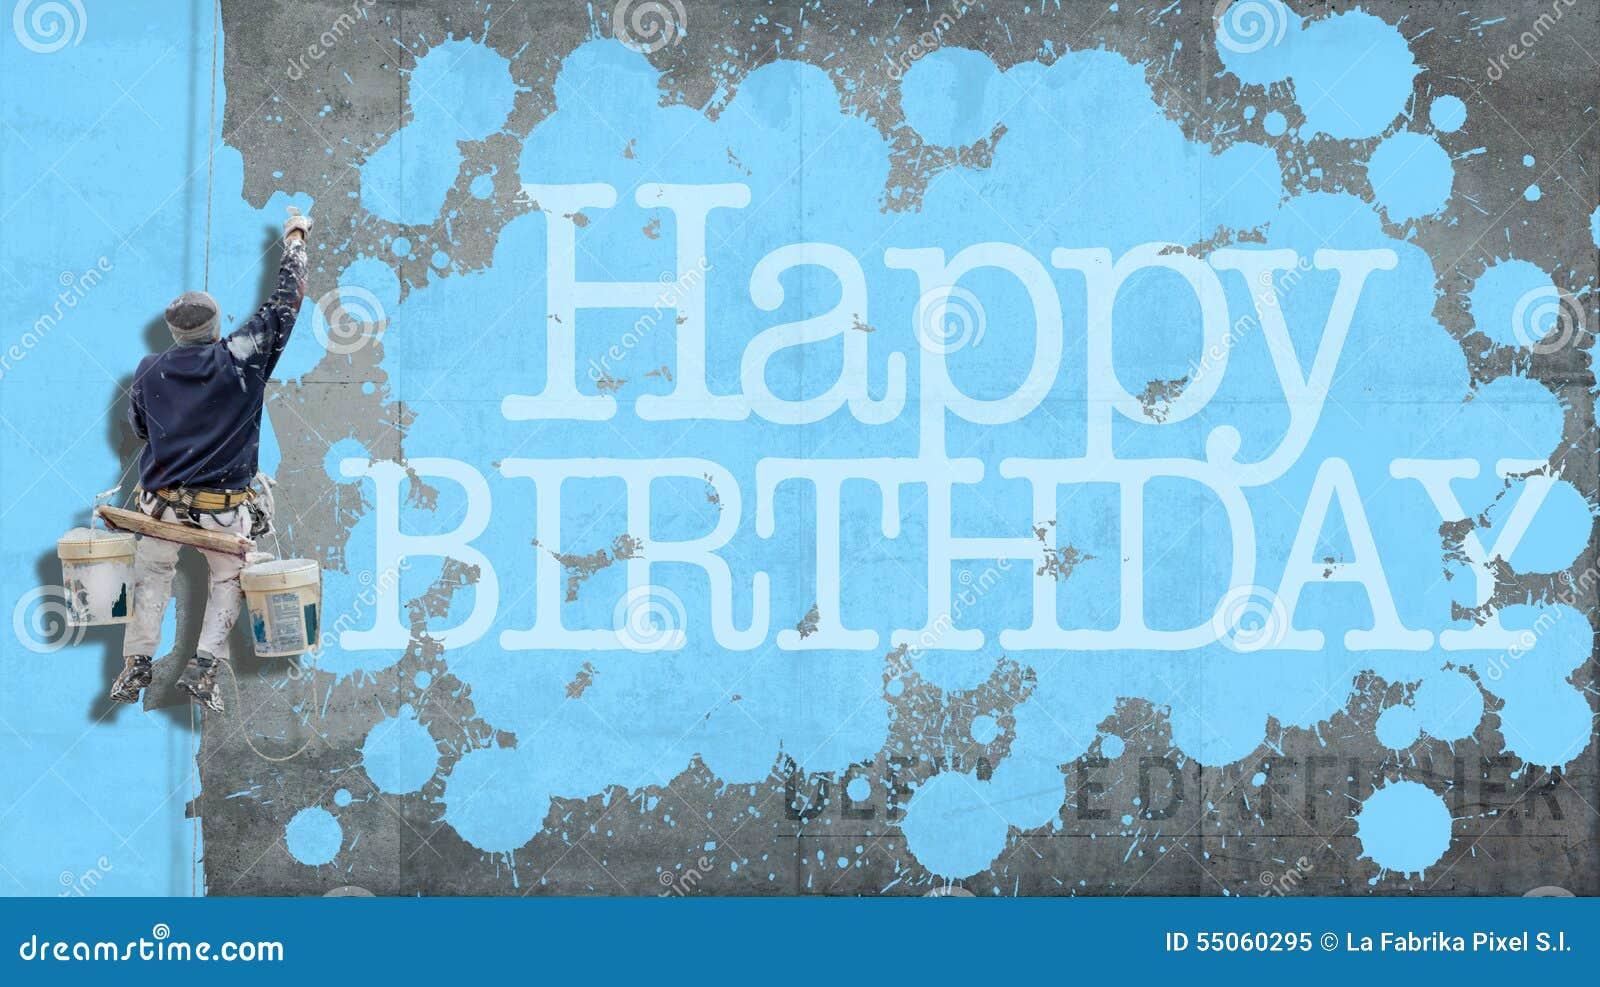 Alles- Gute zum Geburtstagwandblau